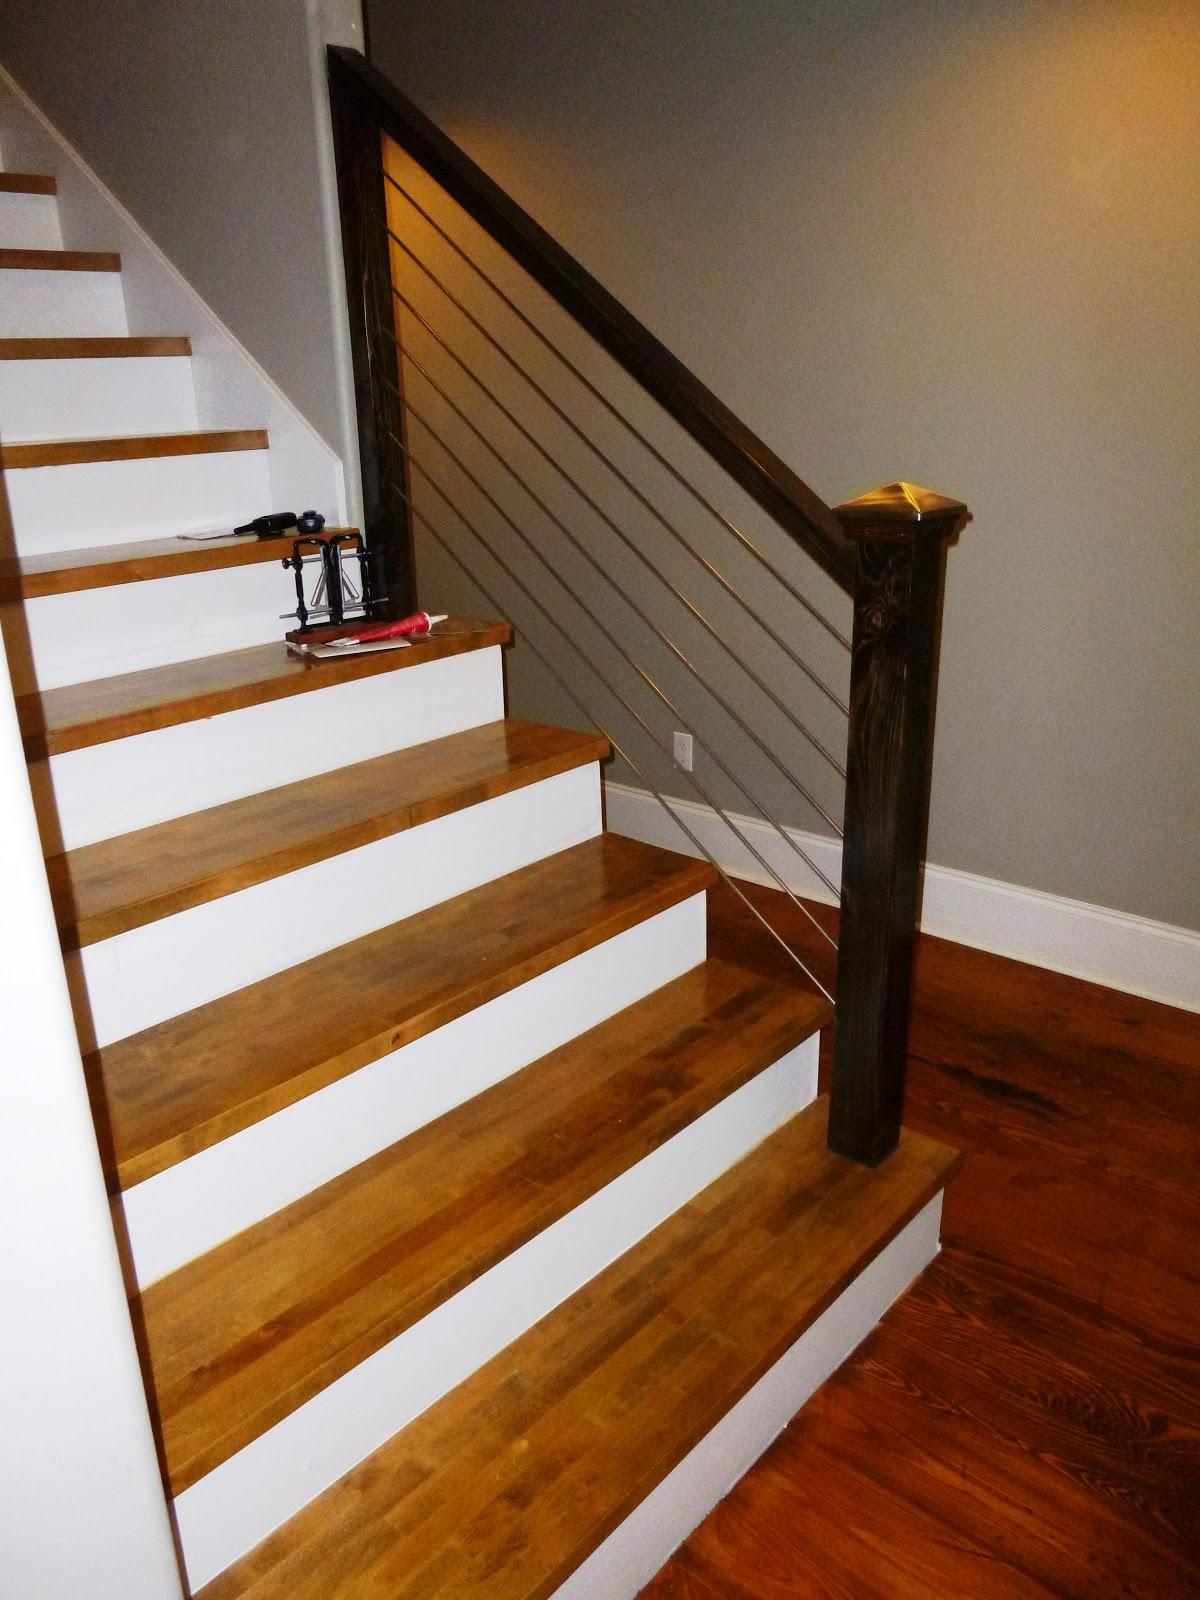 Butcher Block Stair Treads